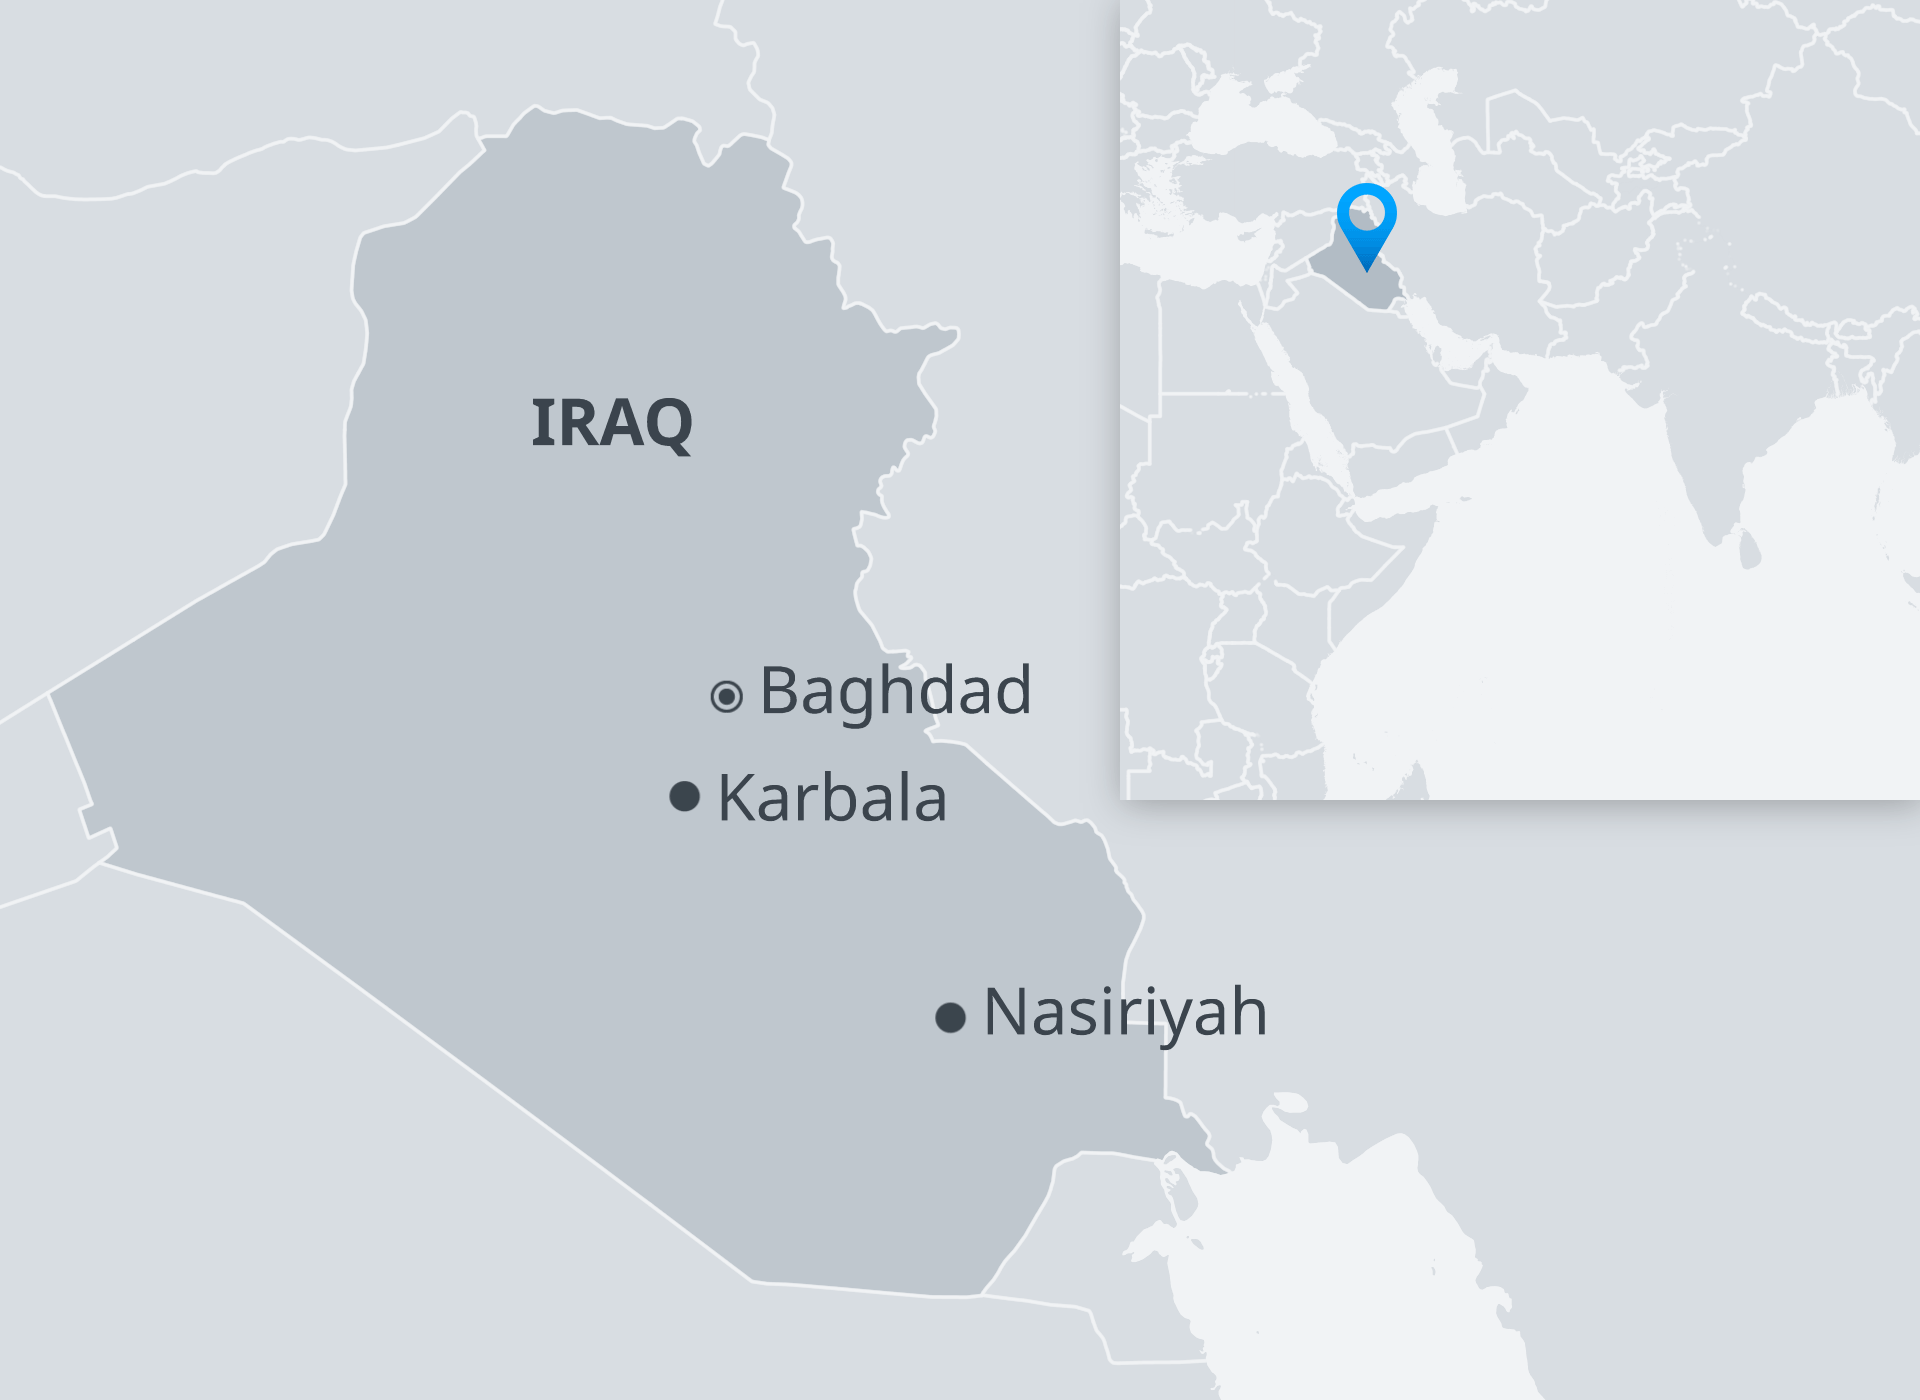 Map showing position of Baghdad, Karbala and Nasiriyah in Iraq